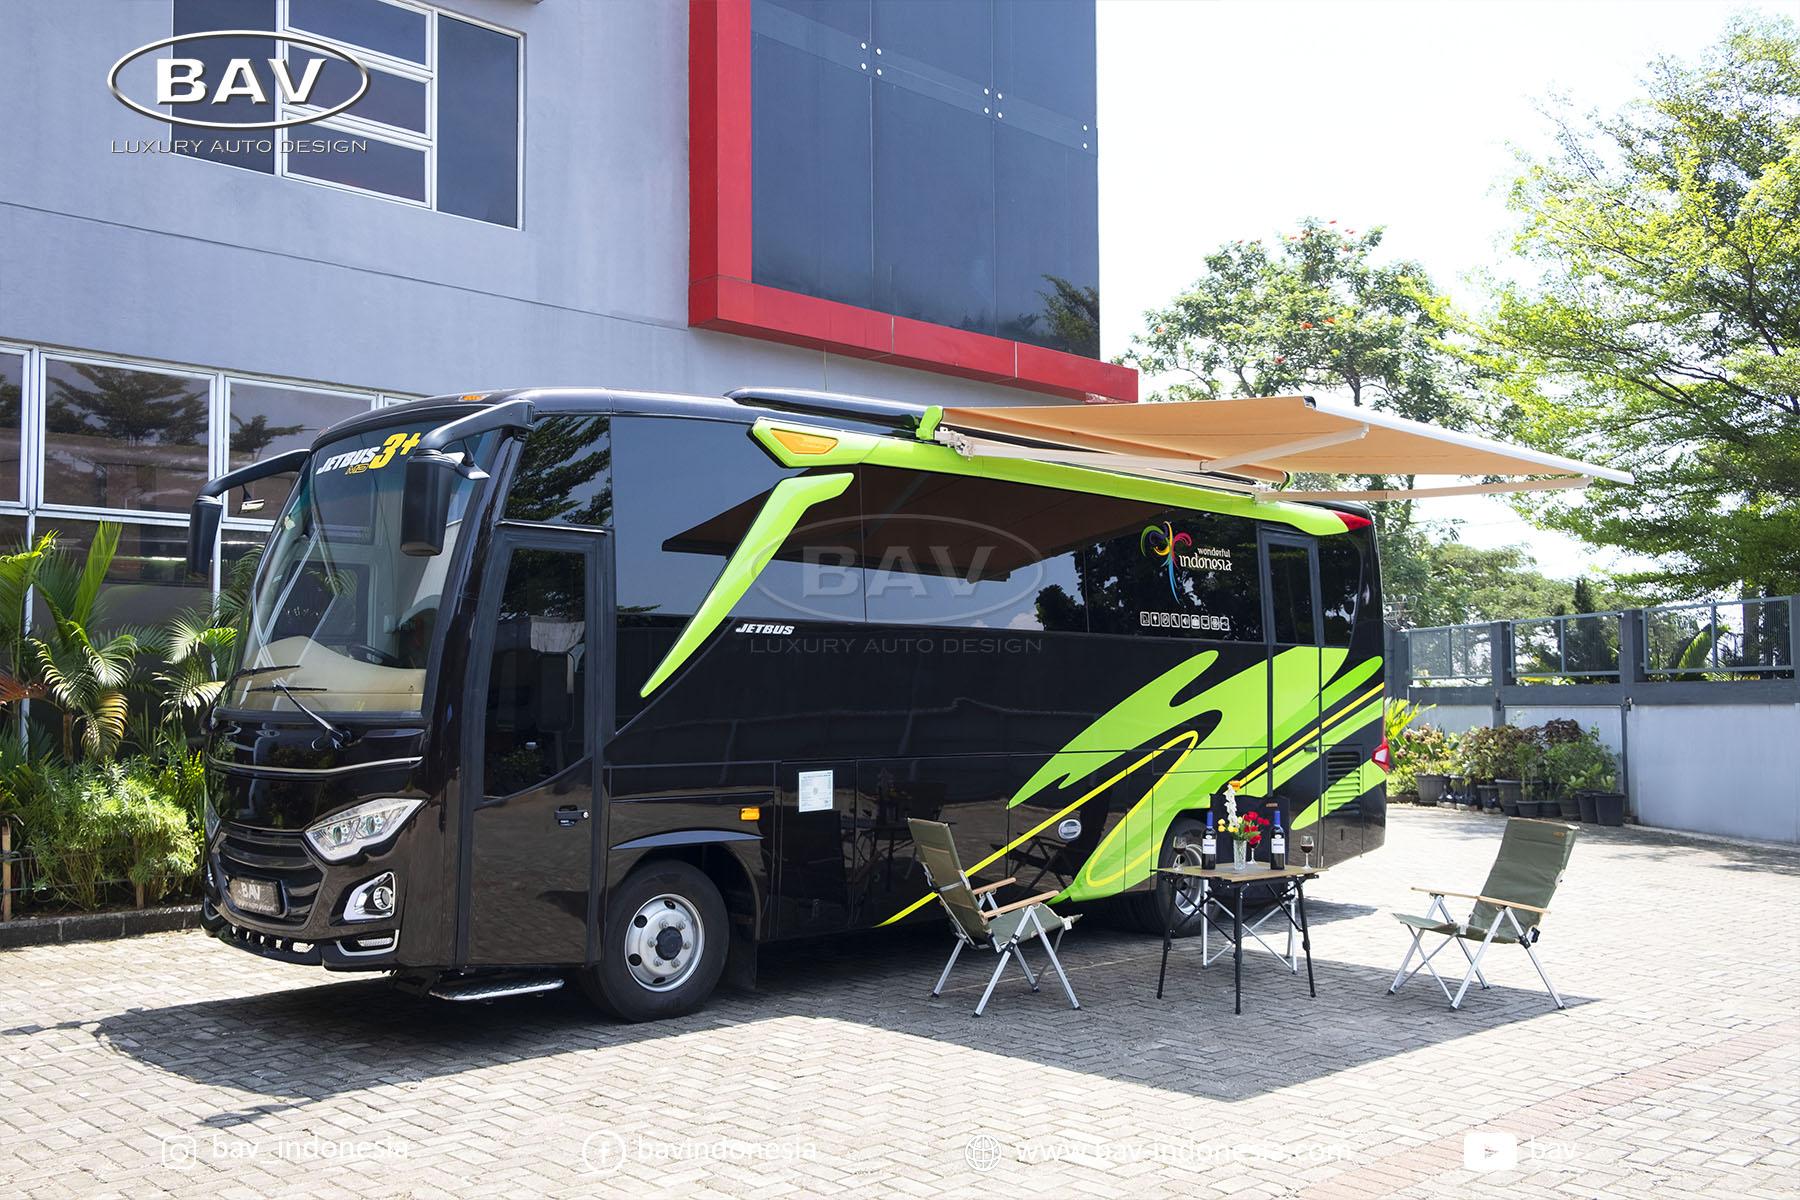 BAV bus 5